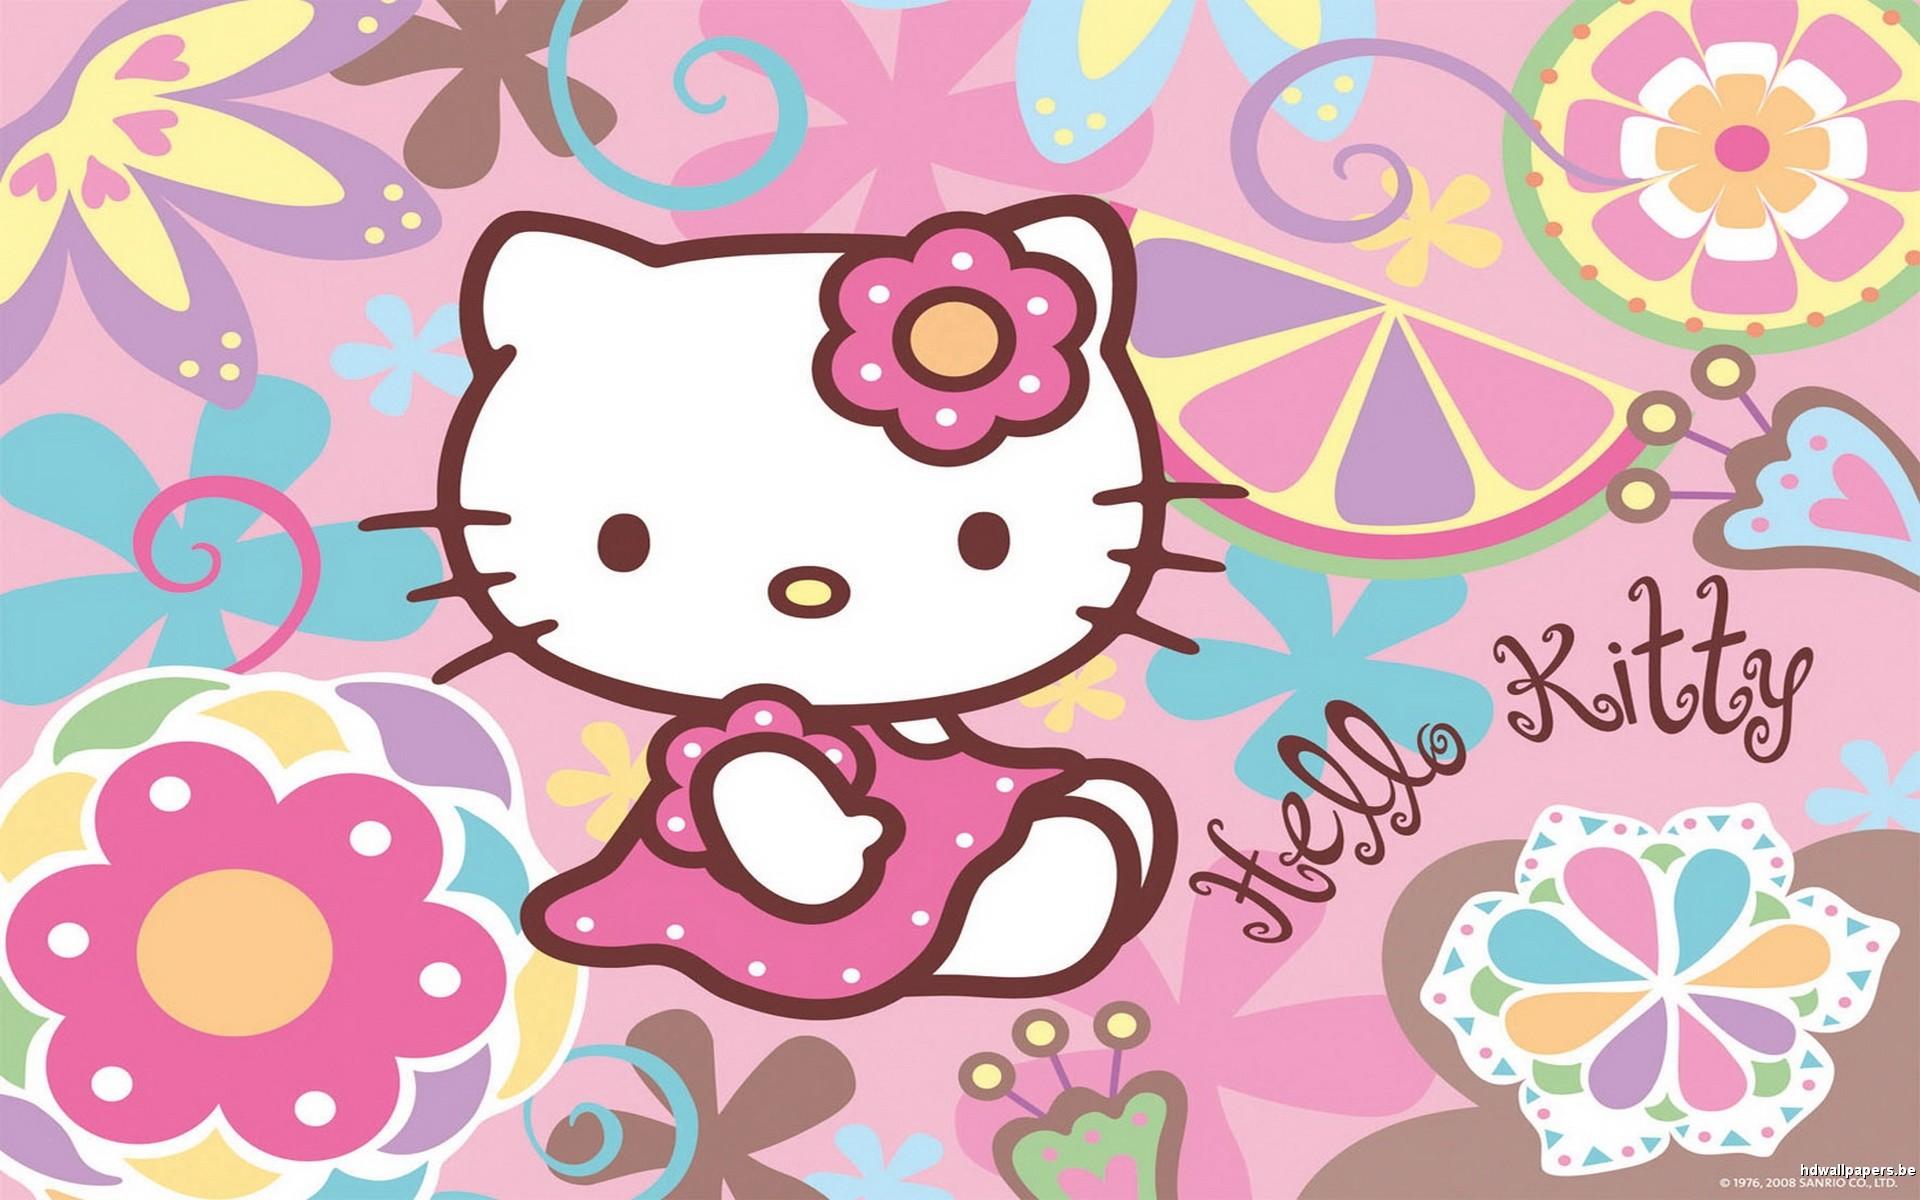 Best Wallpaper Hello Kitty High Definition - 530242-hello-kitty-desktop-background-wallpapers-1920x1200-high-resolution  Picture_74576.jpg